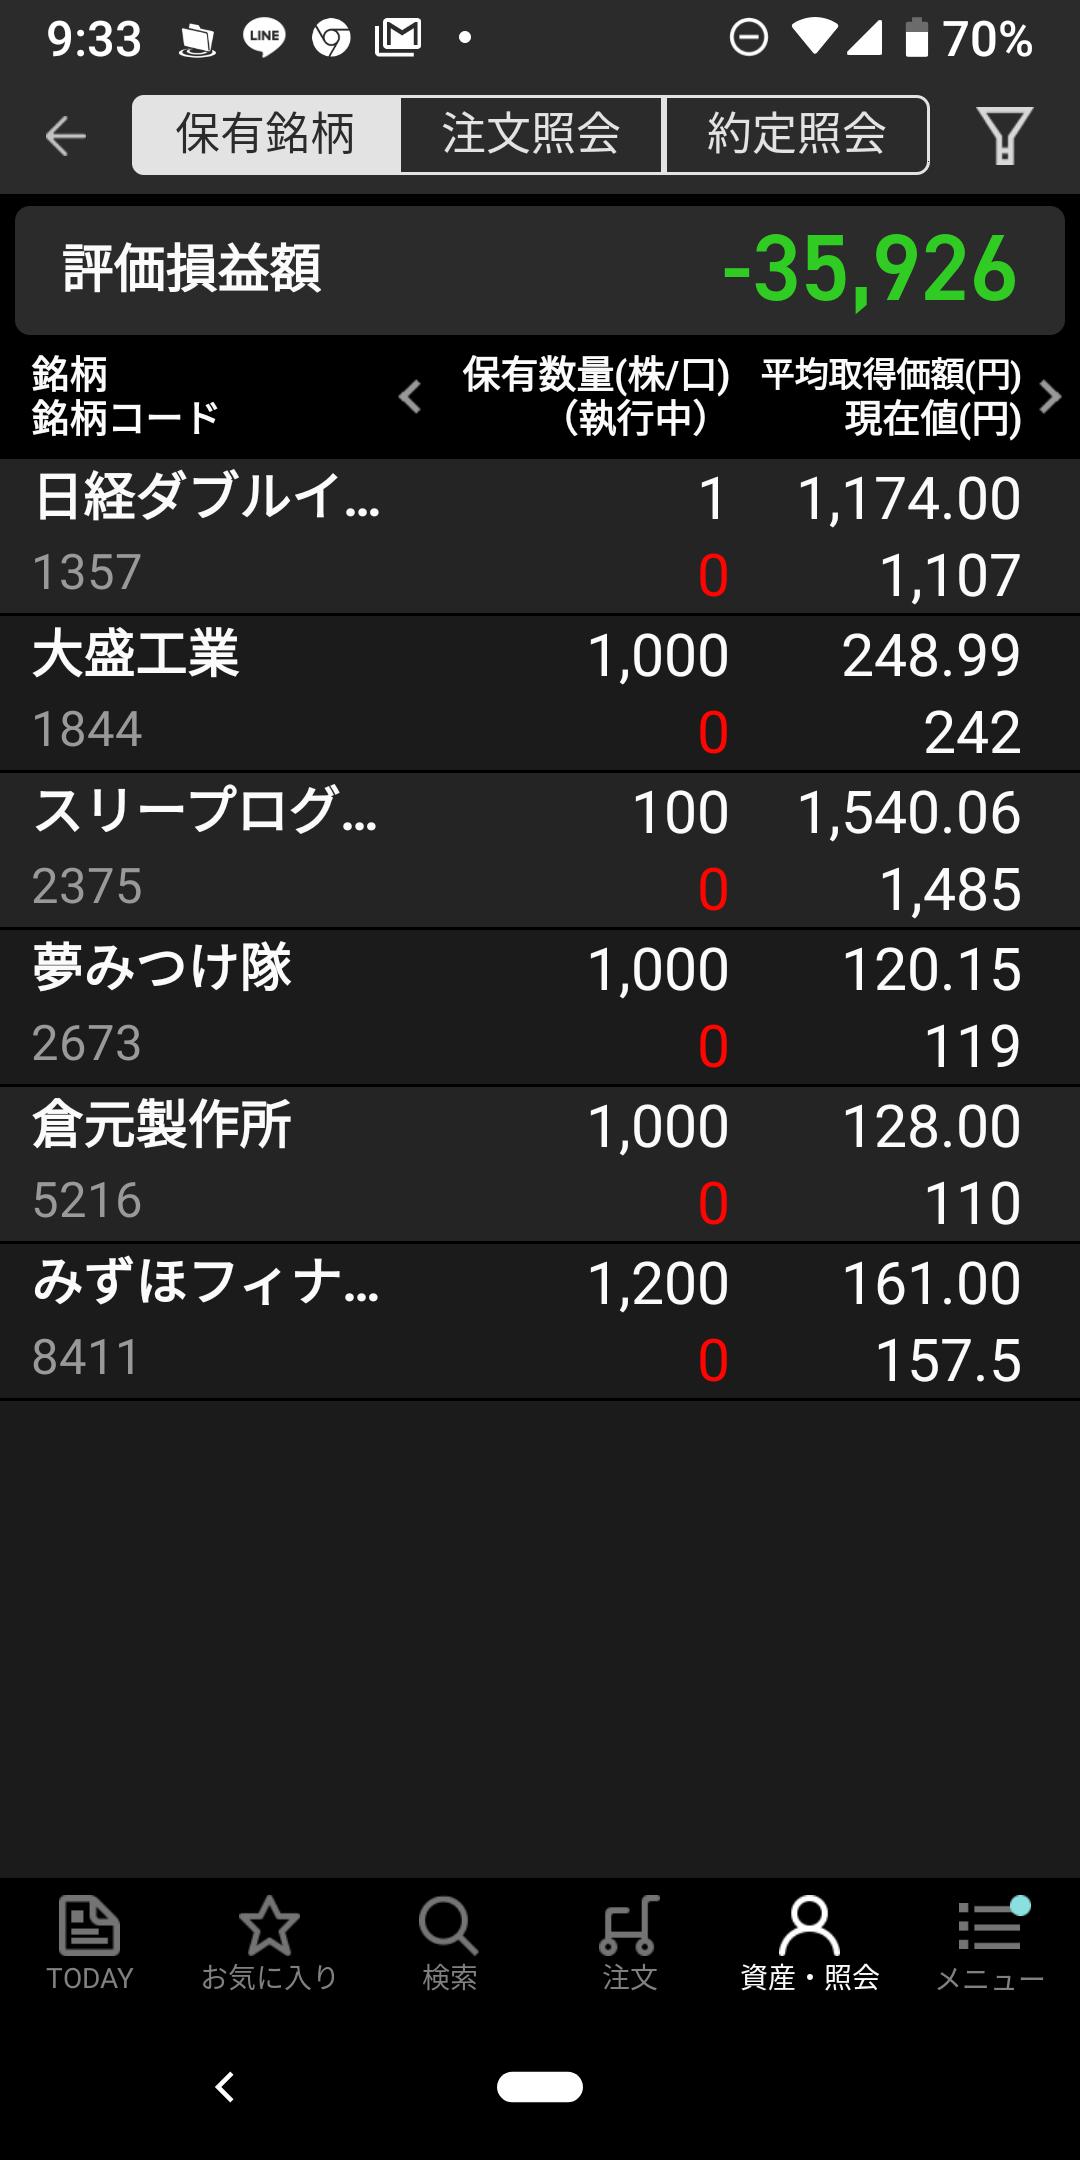 Screenshot (2019_07_02 9_34_00)